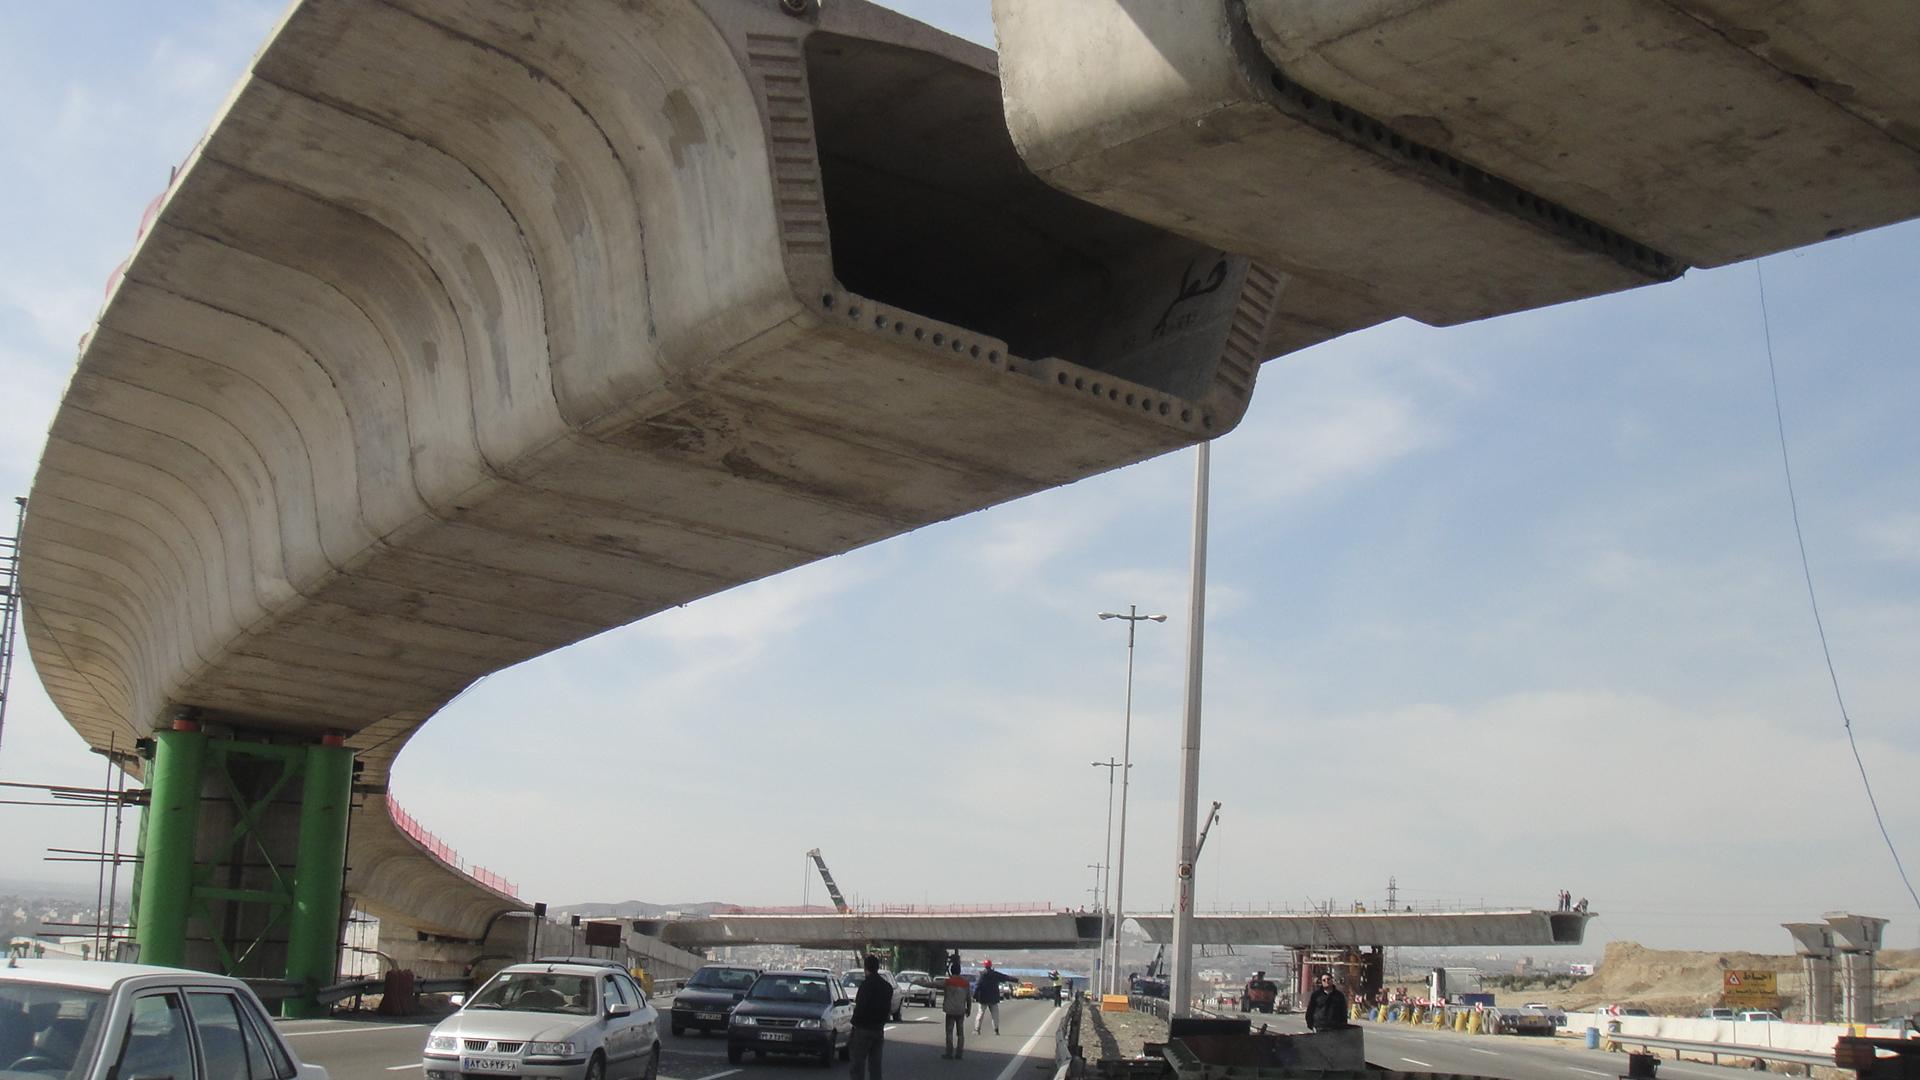 پل حکیم-کاروانسرای سنگی 2